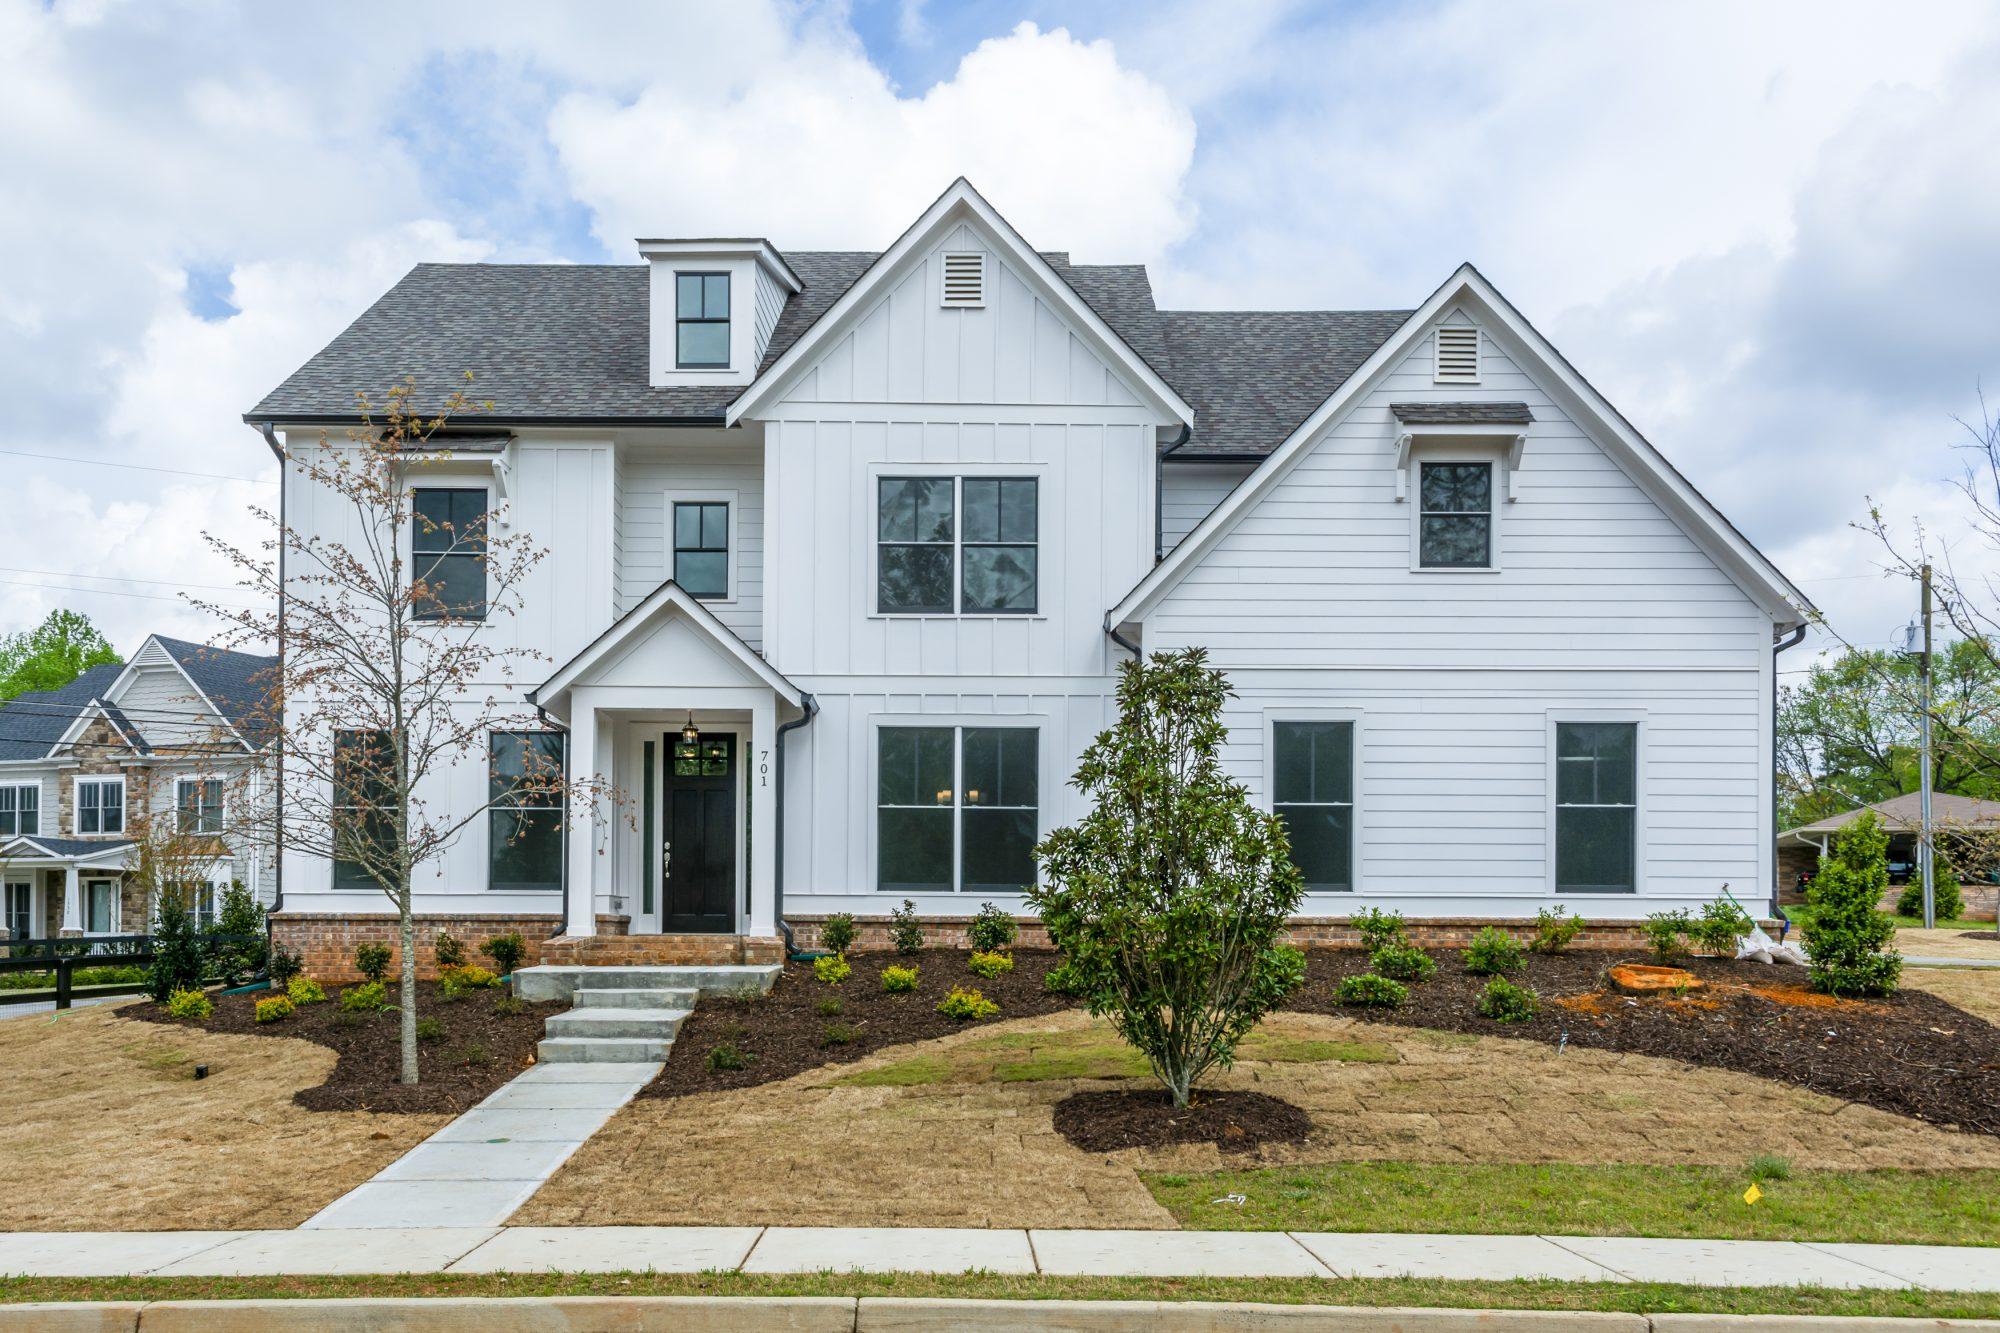 New homes in Johns Creek at Parsons Retreat - O'Dwyer Homes of Atlanta